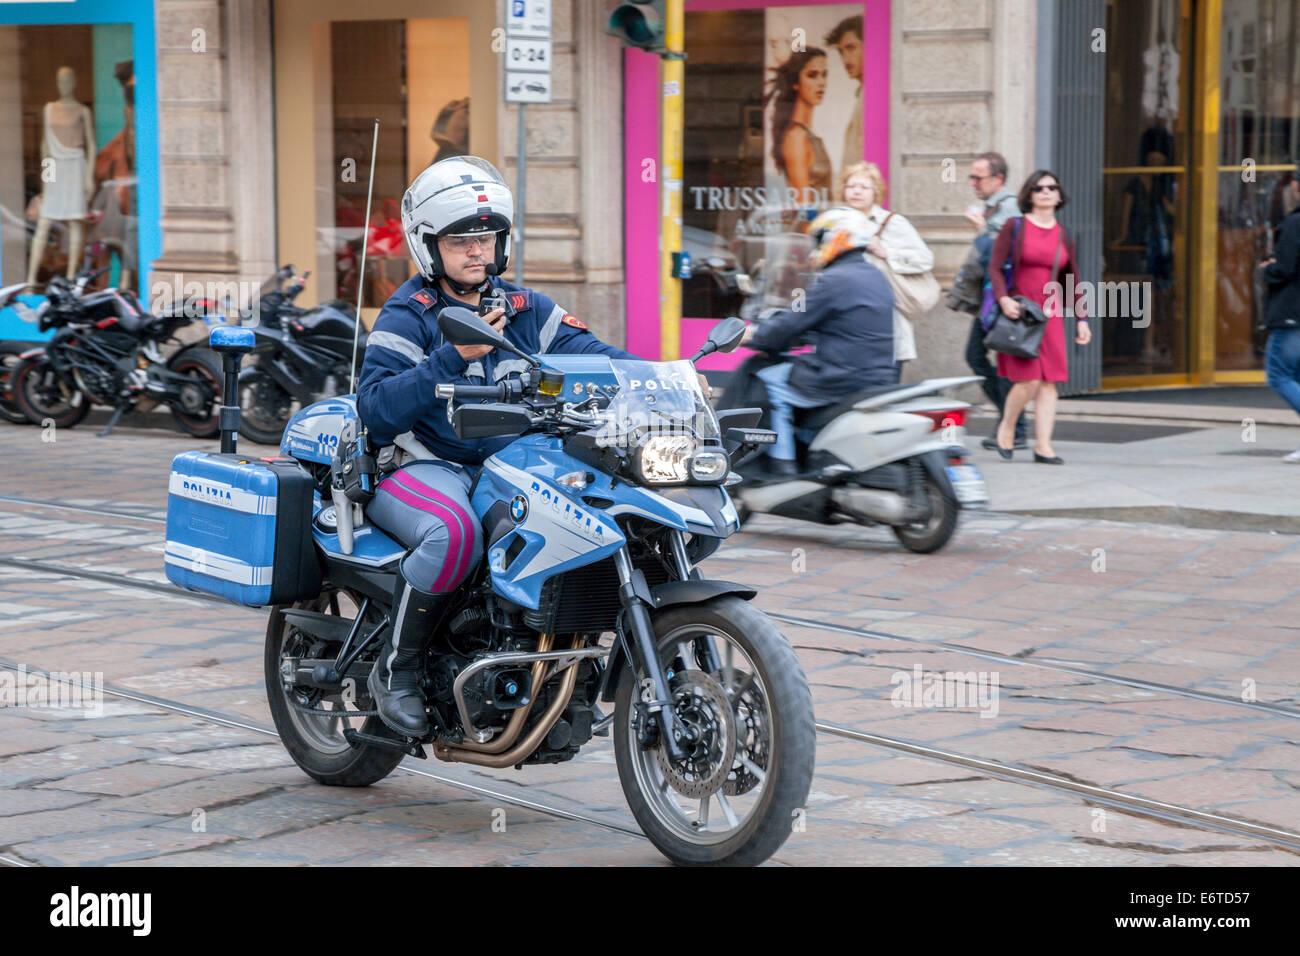 Italian Polizia motorcycle policeman looking at telephone while riding motorbike - Stock Image